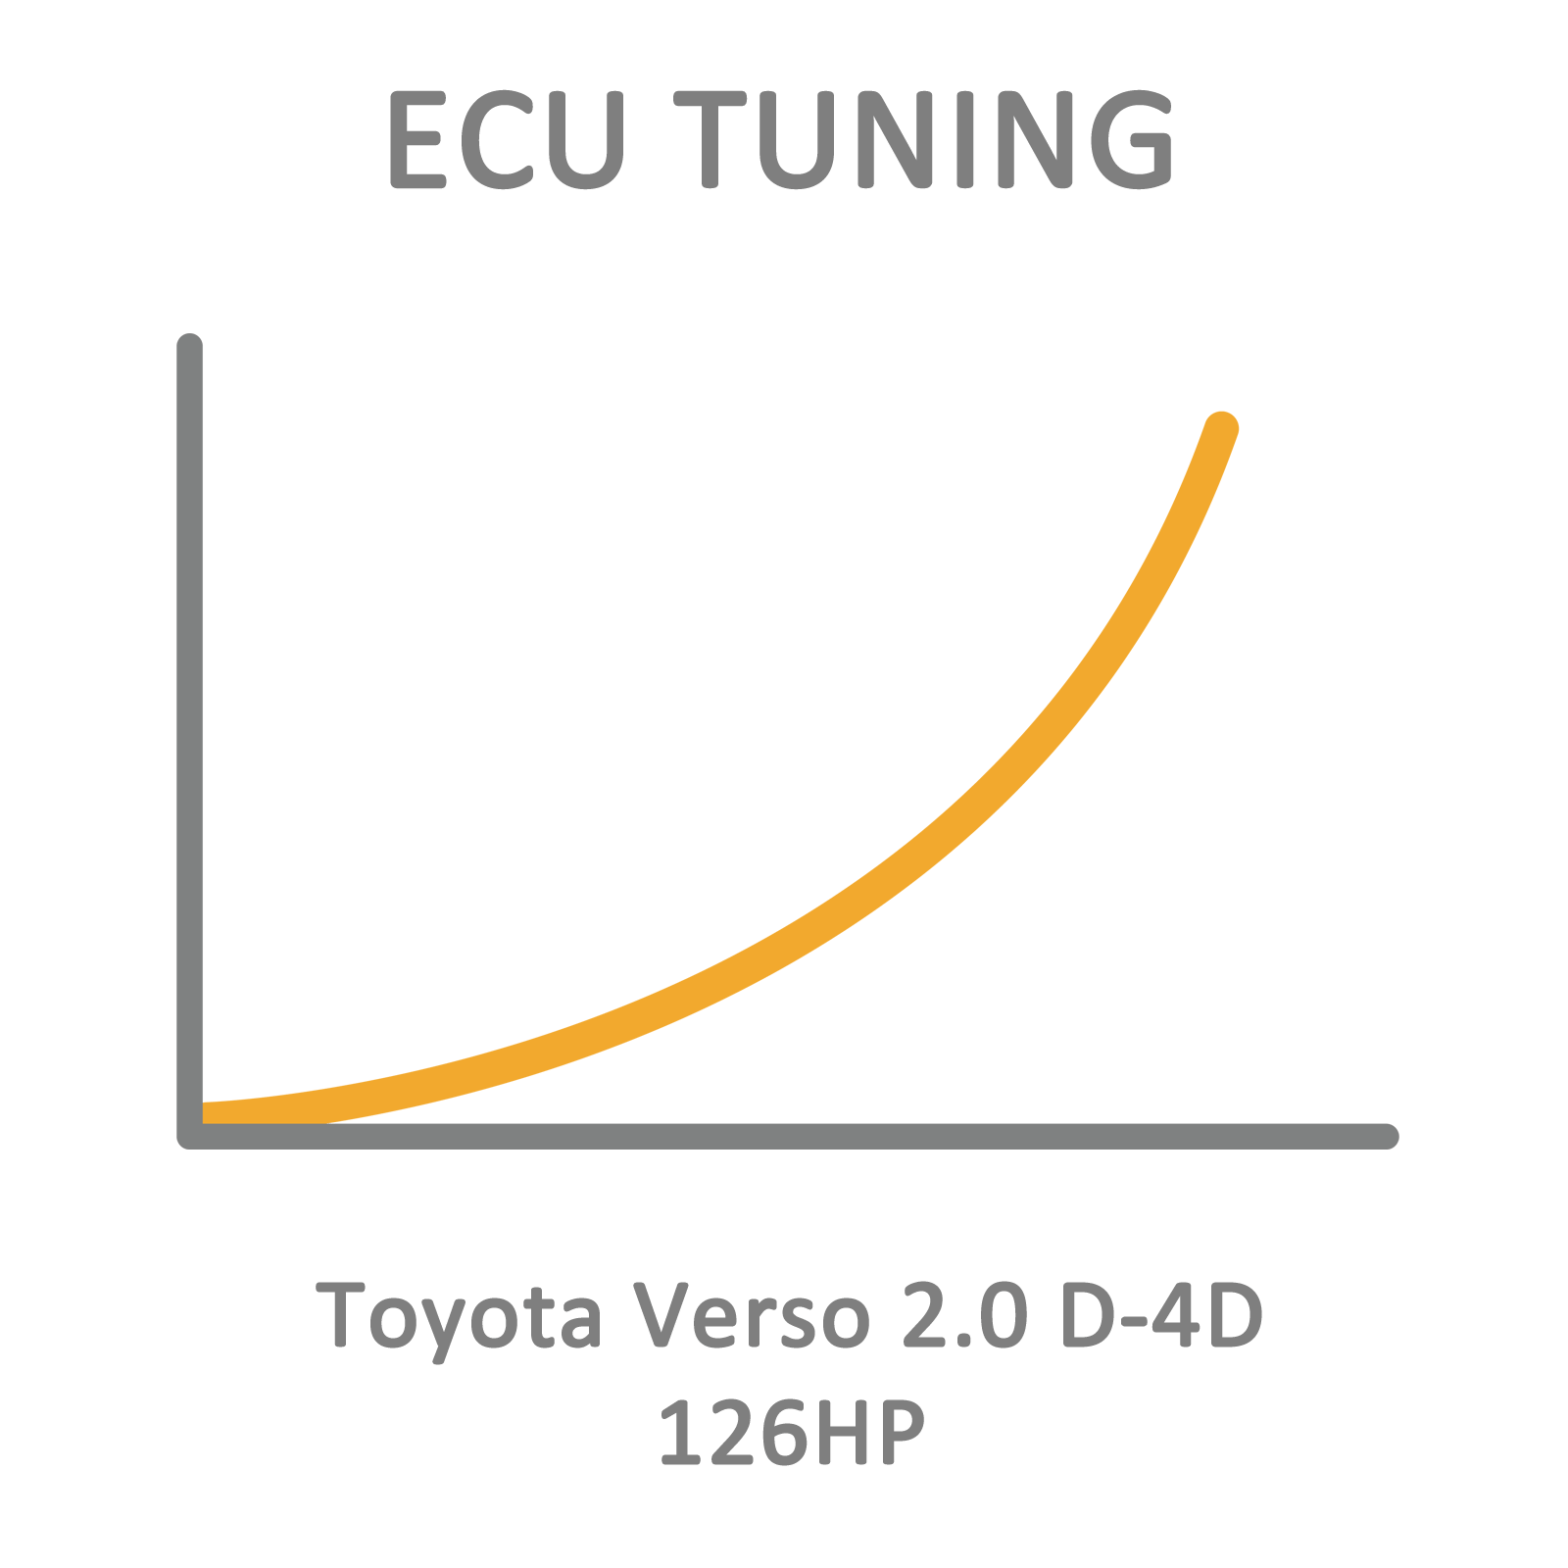 Toyota Verso 2.0 D-4D 126HP ECU Tuning Remapping Programming